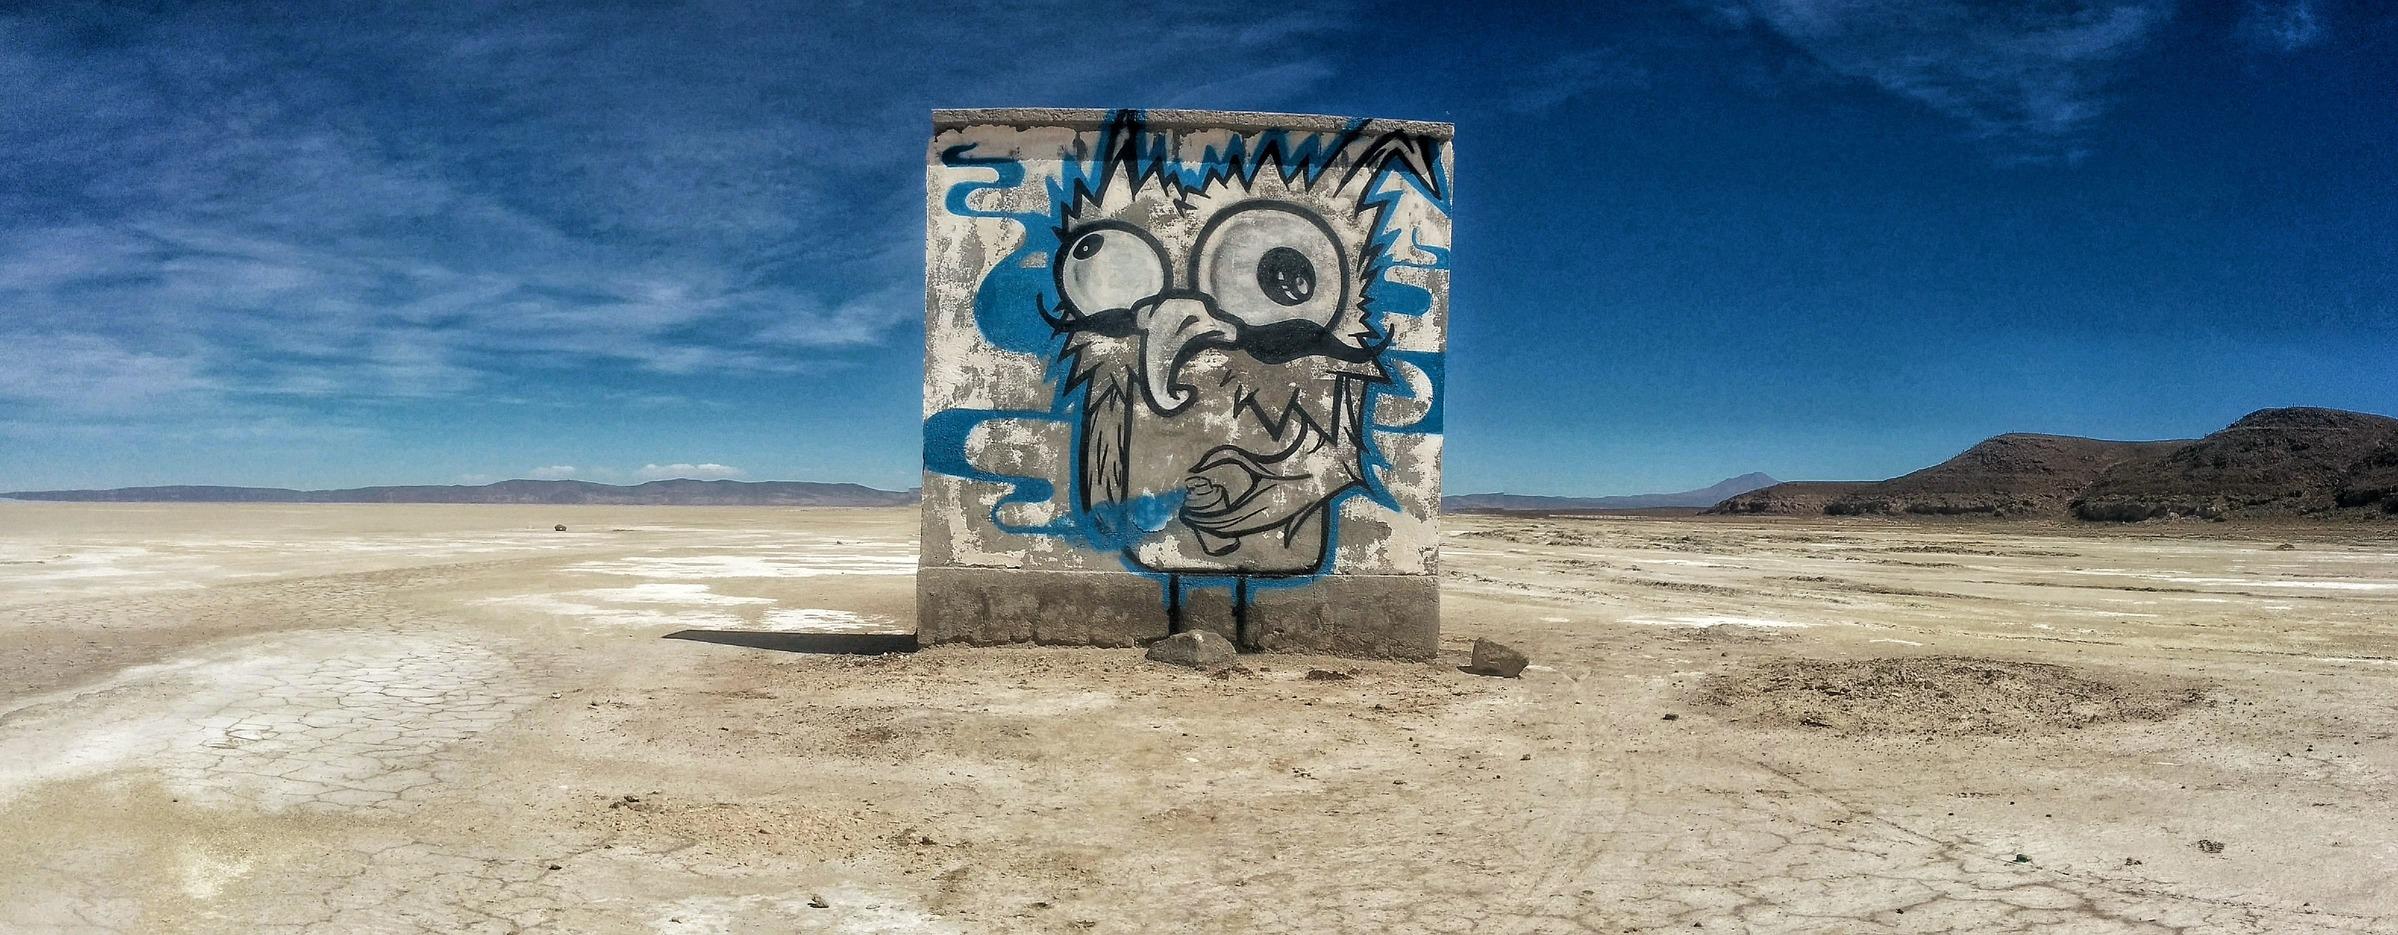 mur devis murale peinture desert chouette graffiti